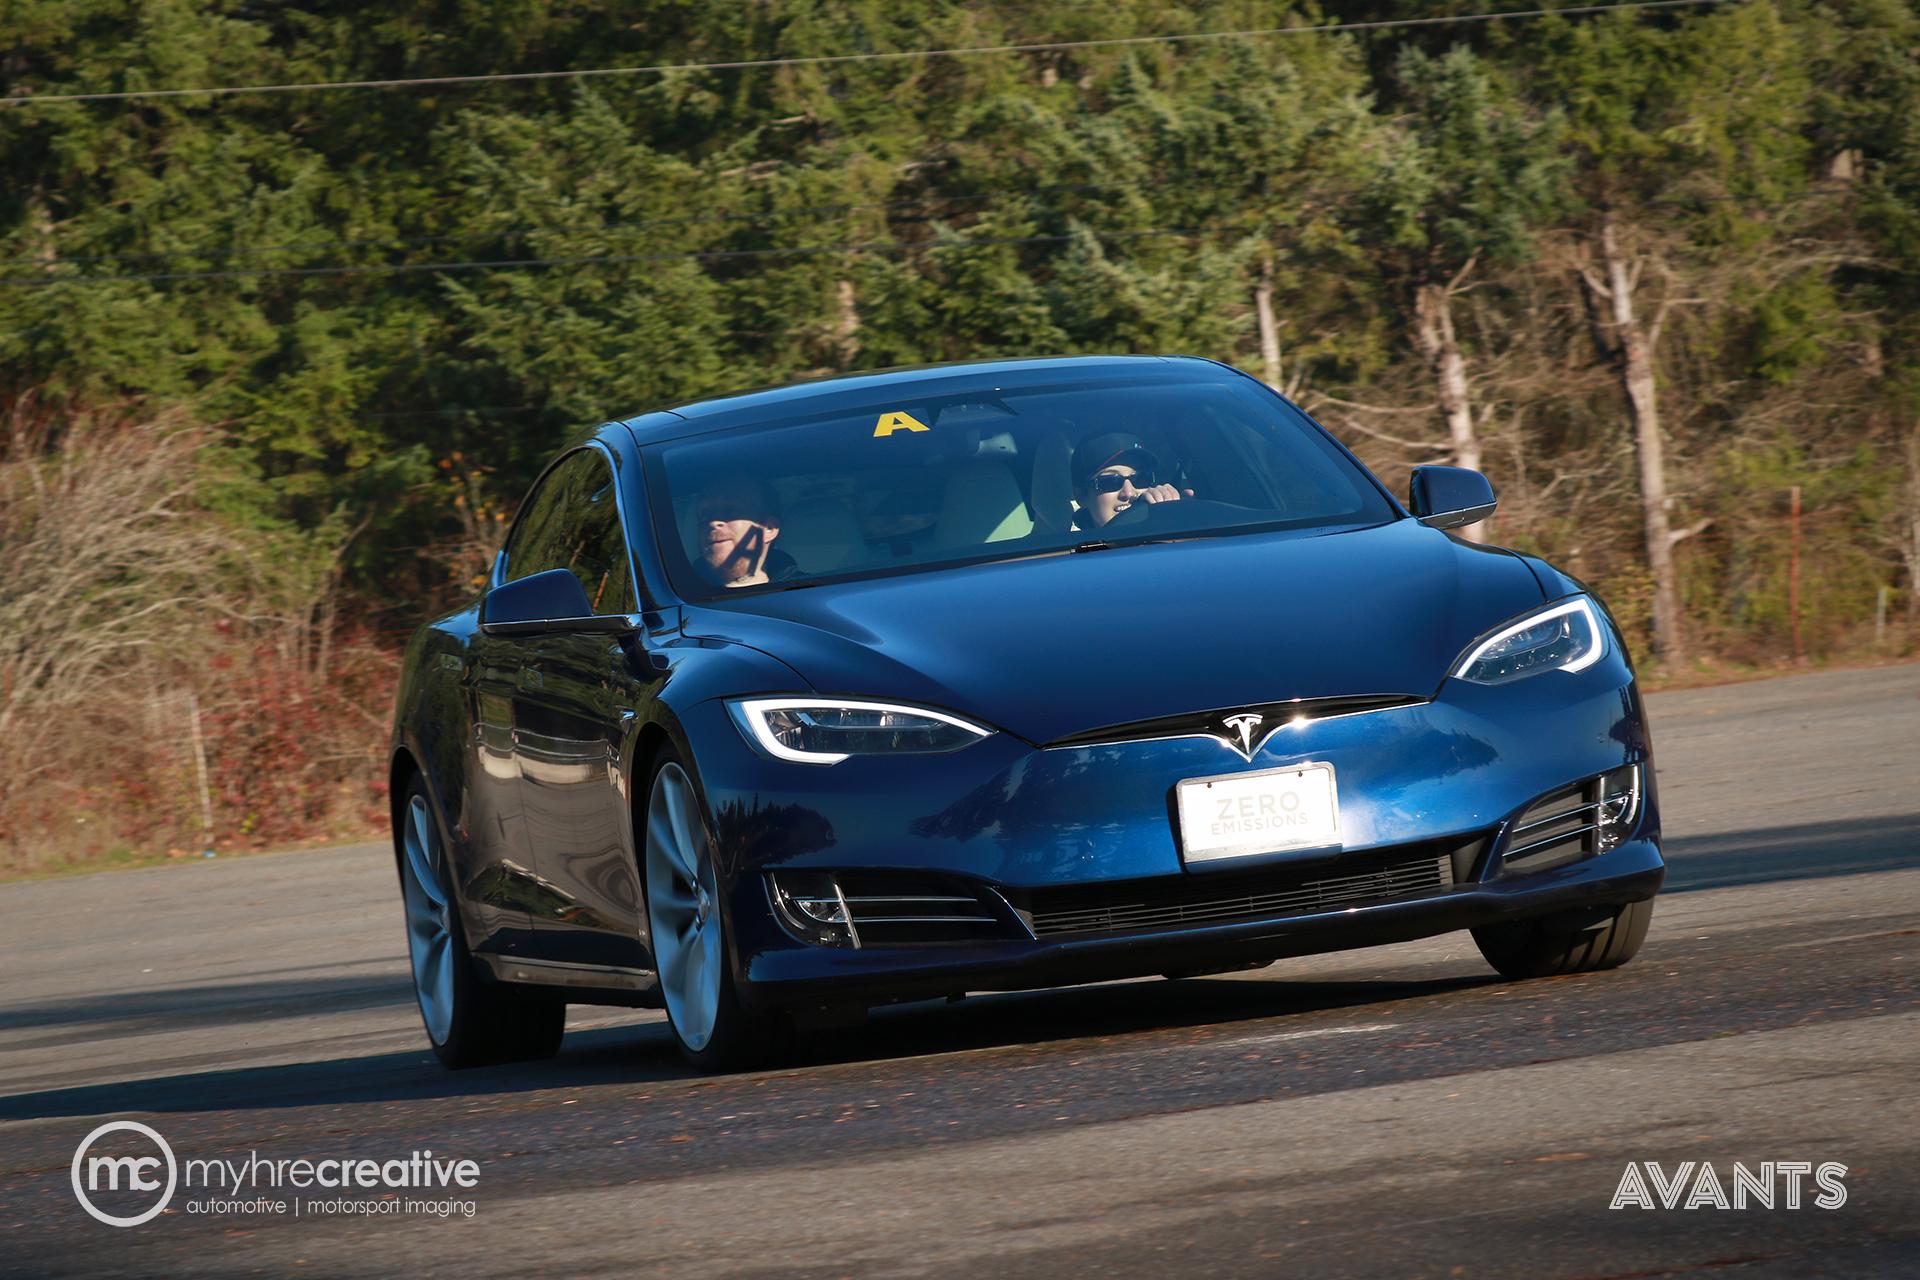 Tesla_MyhreCreative_Avants_02.jpg